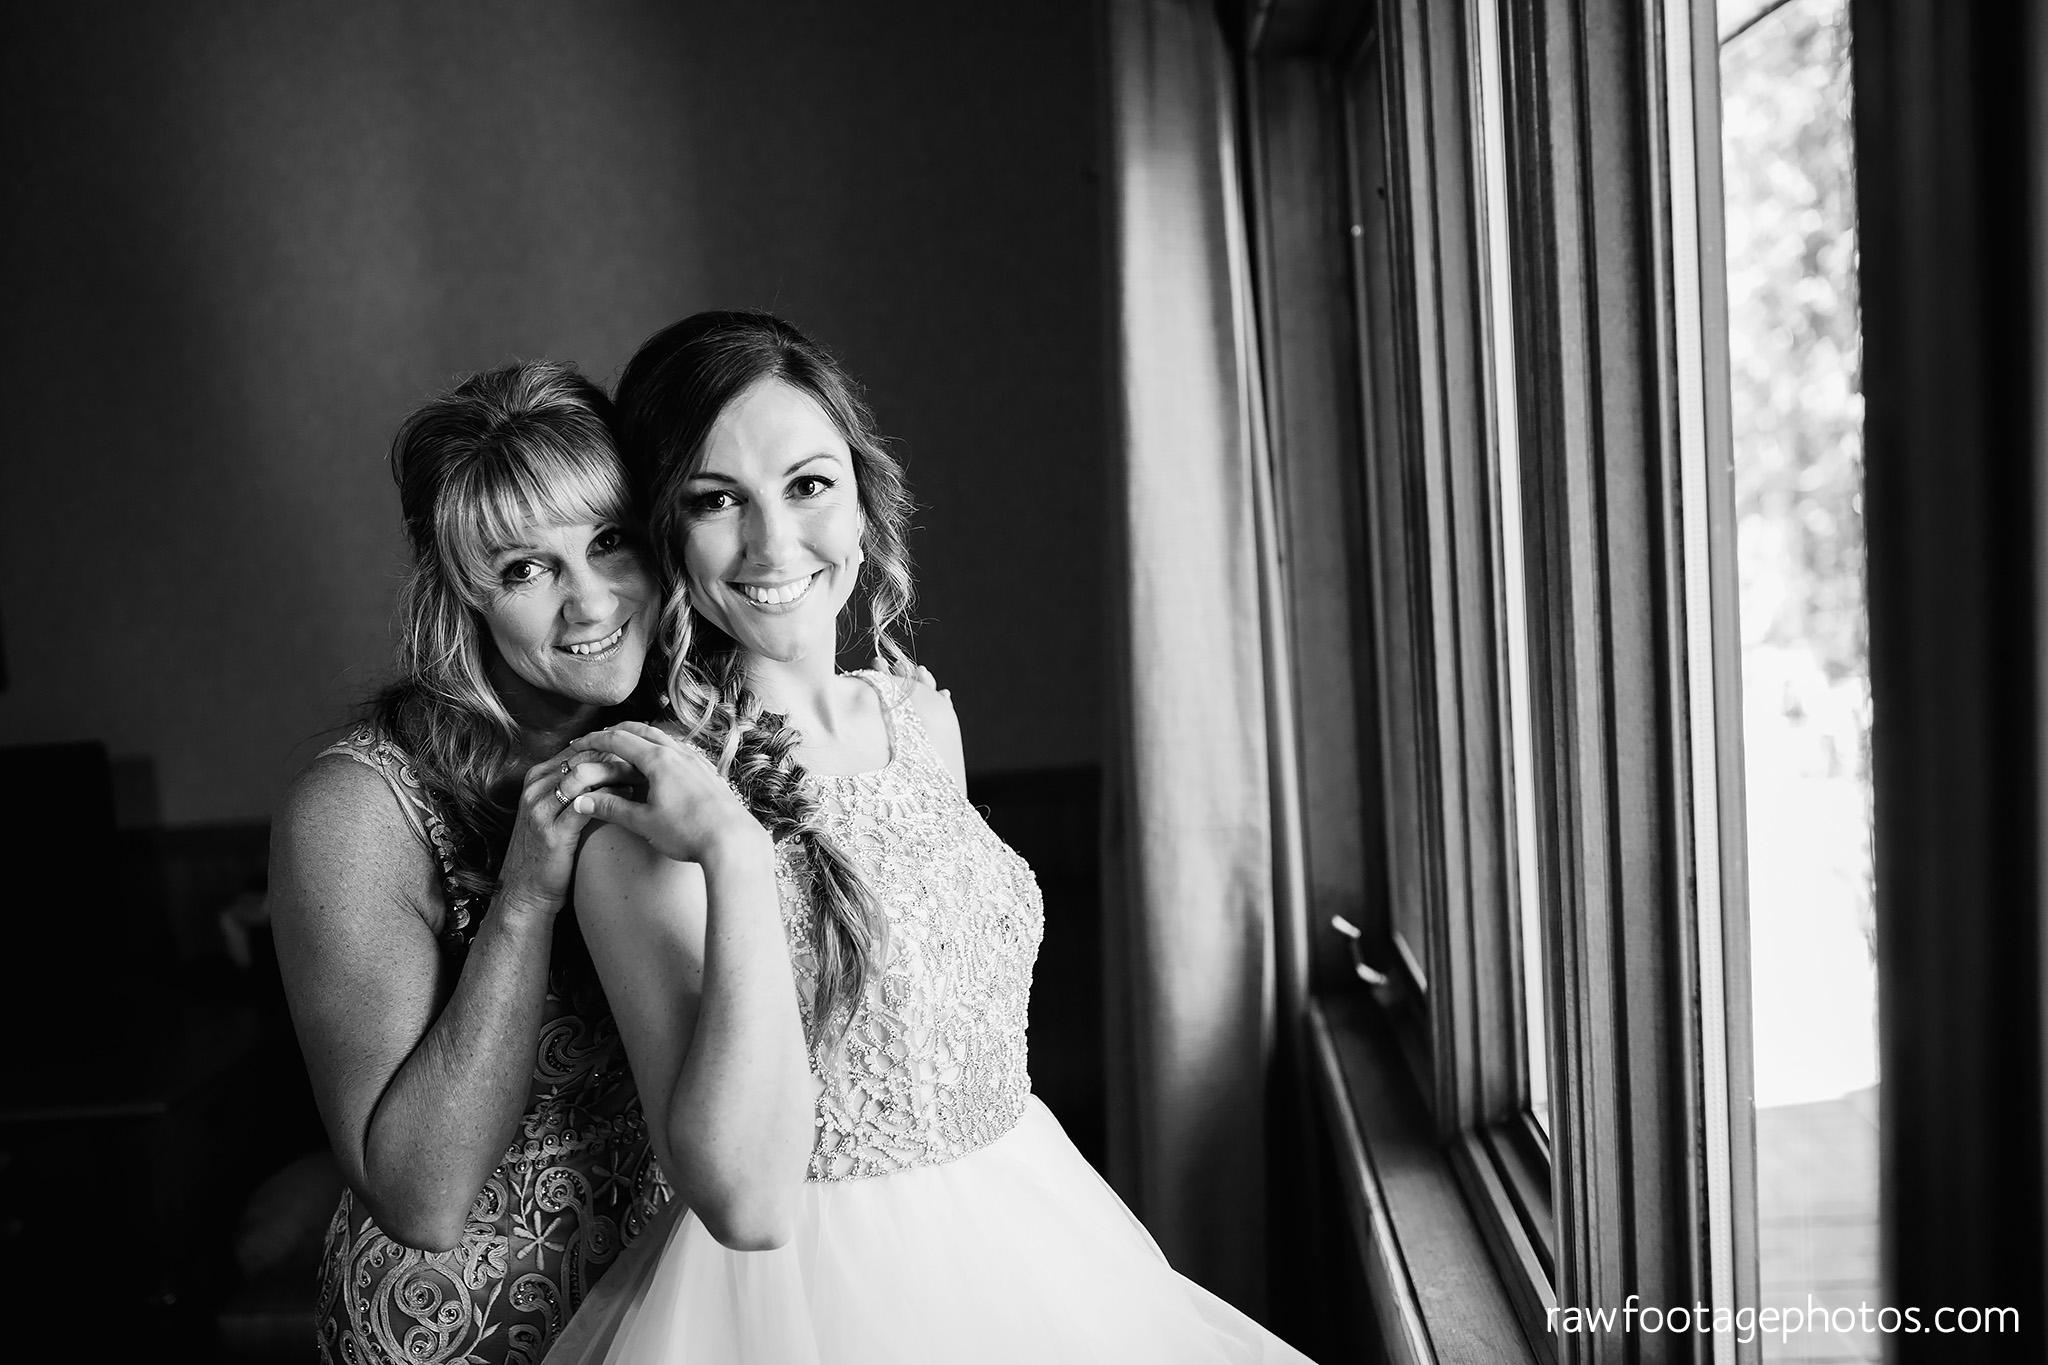 london_ontario_wedding_photographer-grand_bend_wedding_photographer-oakwood_resort_wedding-beach_wedding-sunset_wedding-raw_footage_photography019.jpg